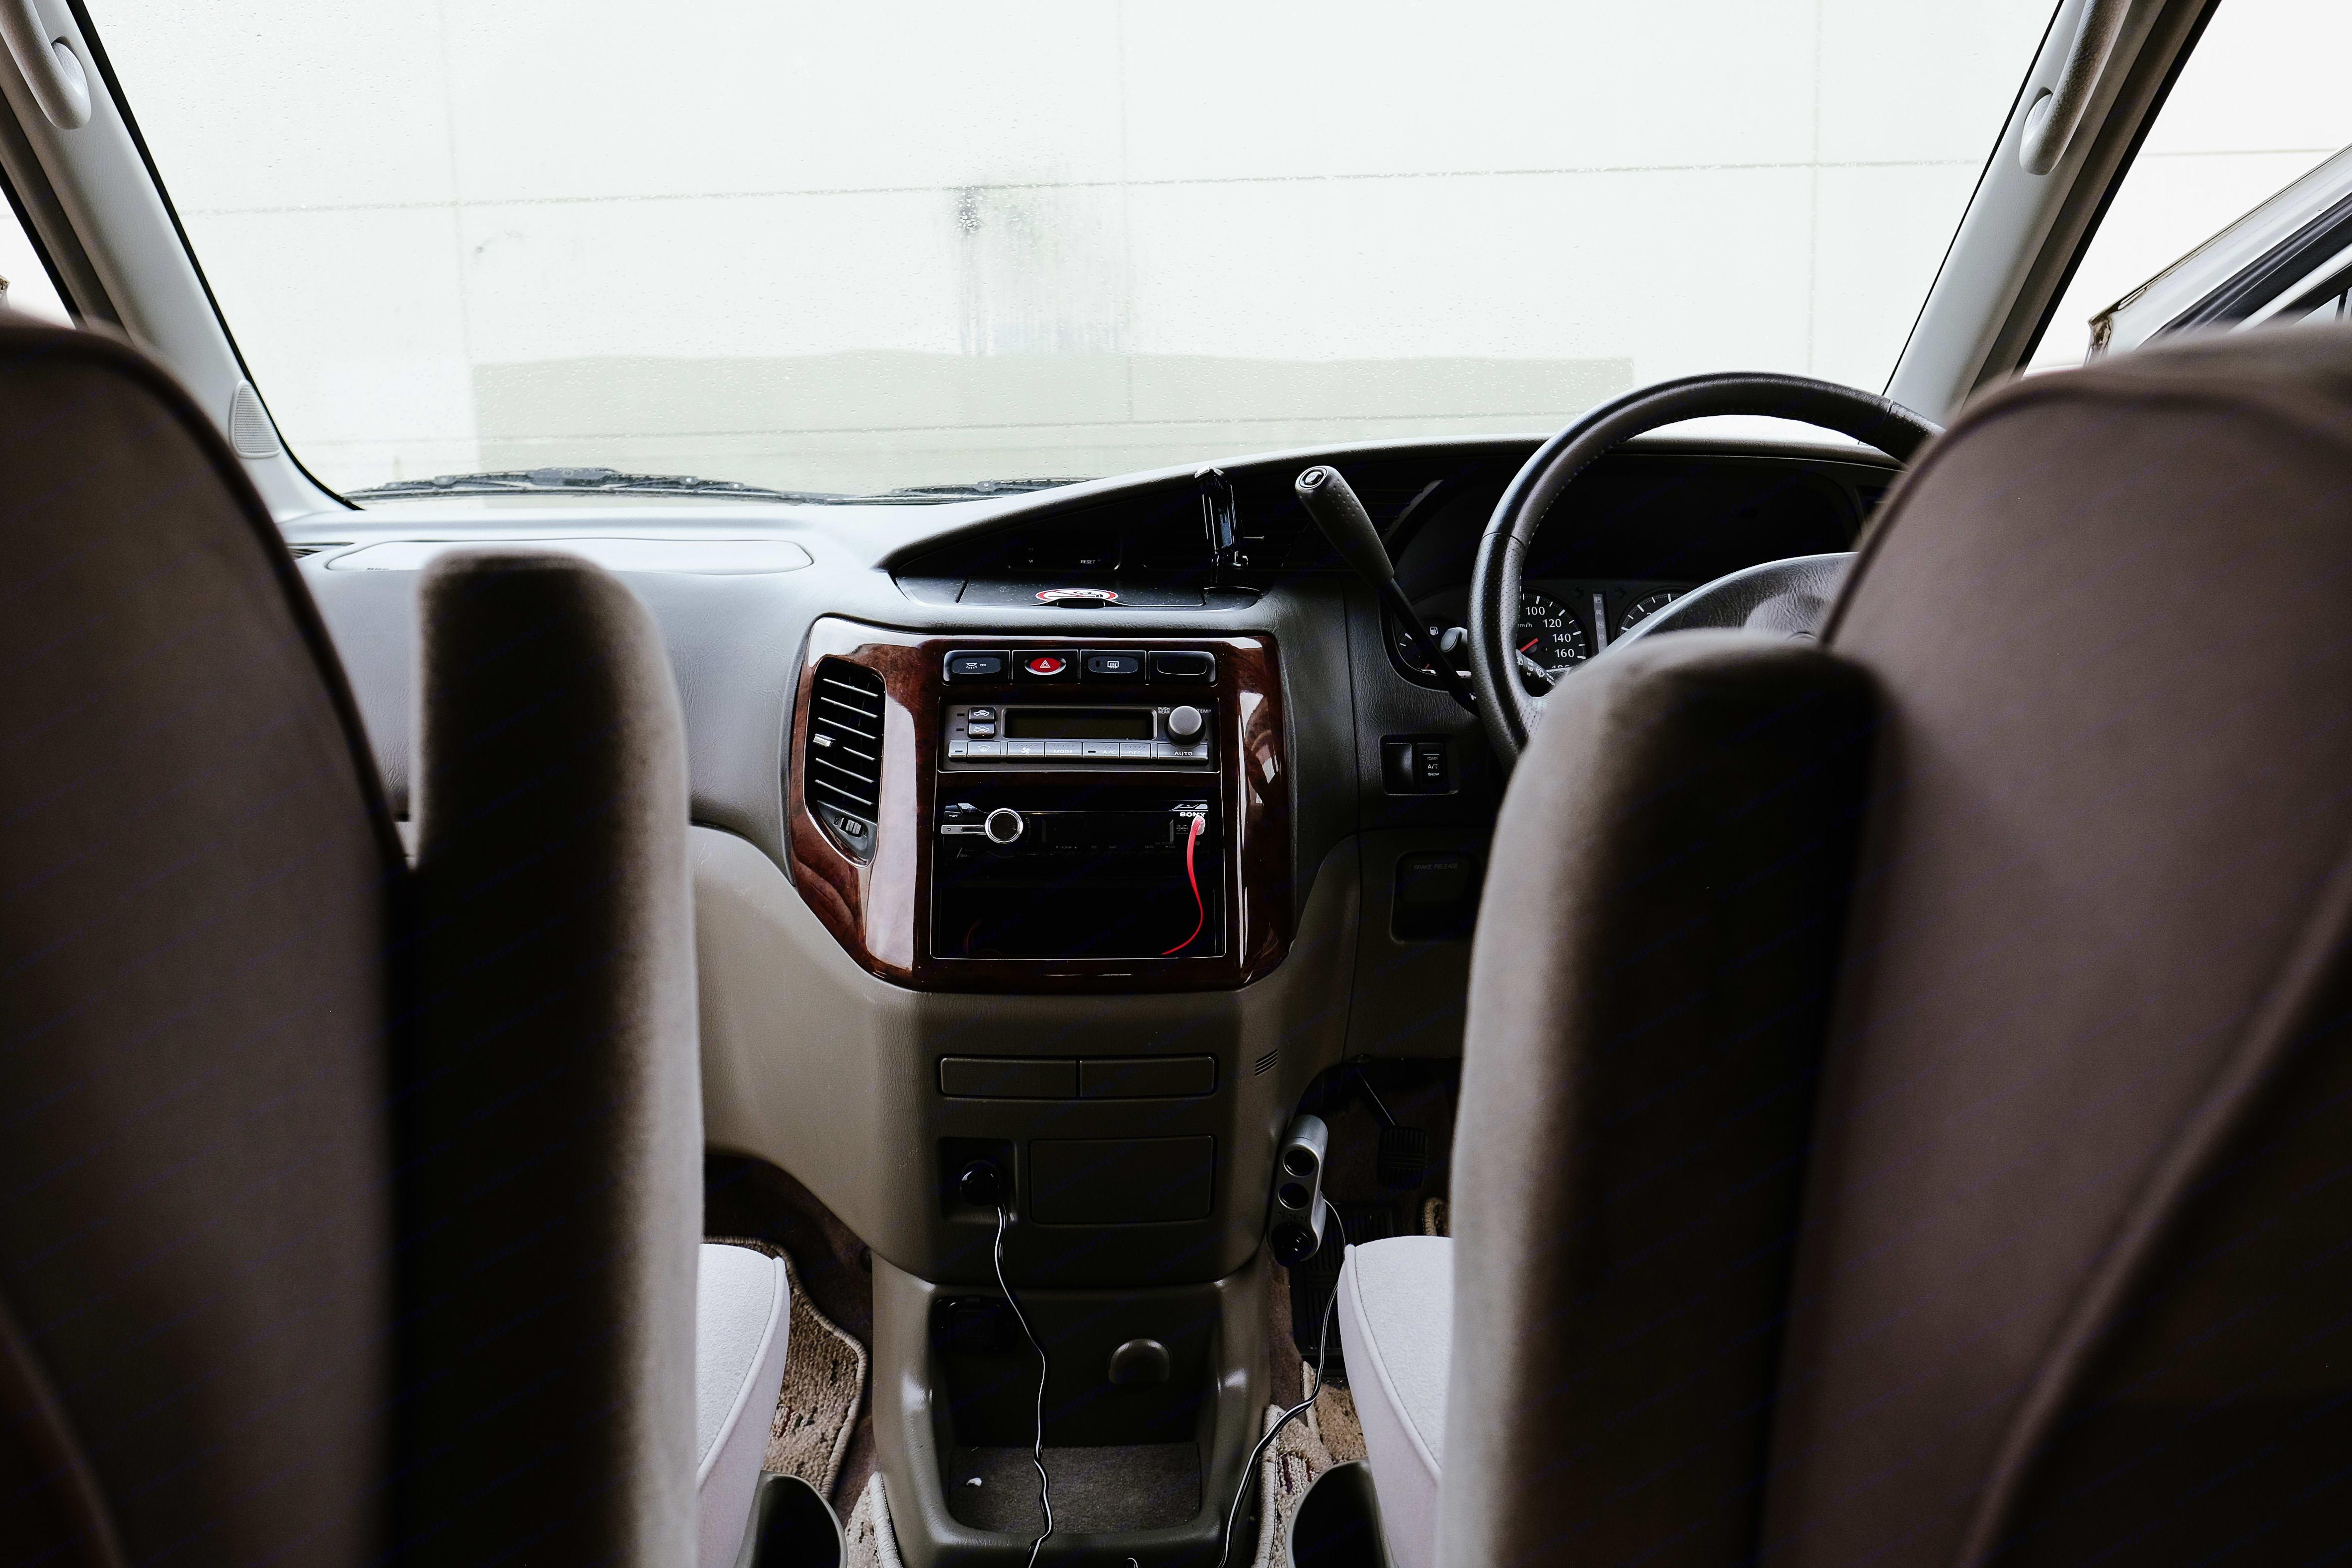 Nissan Elgrand 2005